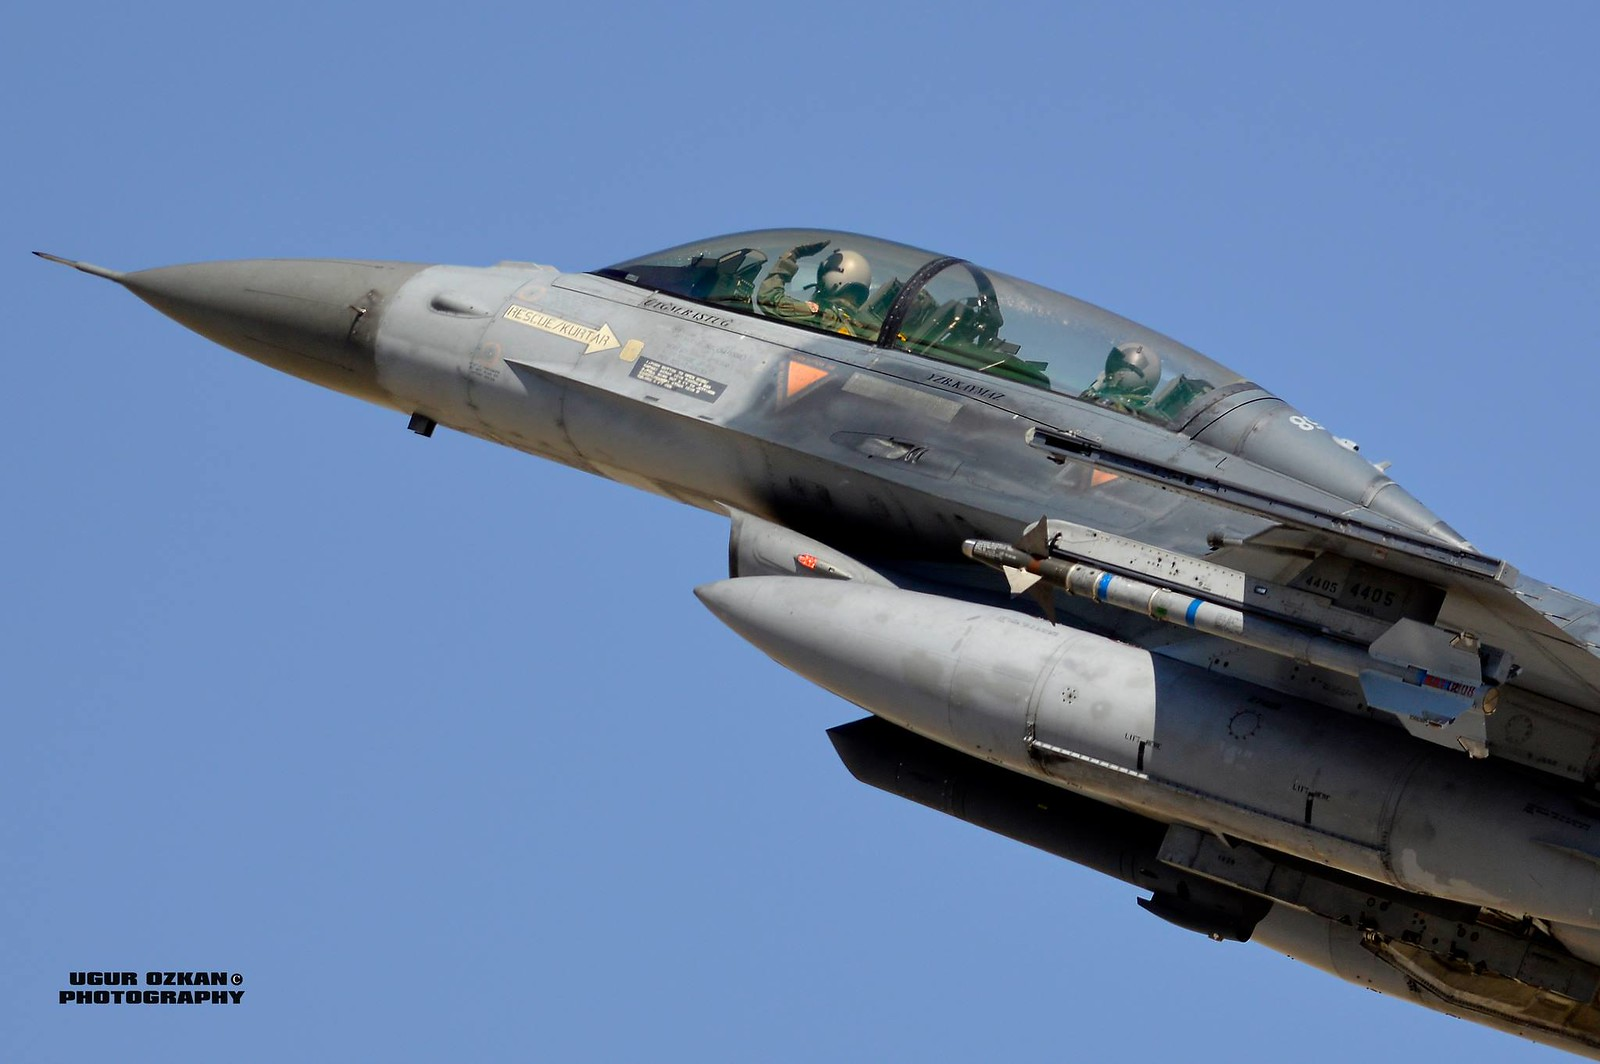 F-16 Fighting Falcon - Page 2 9101431194_33b890b12c_h